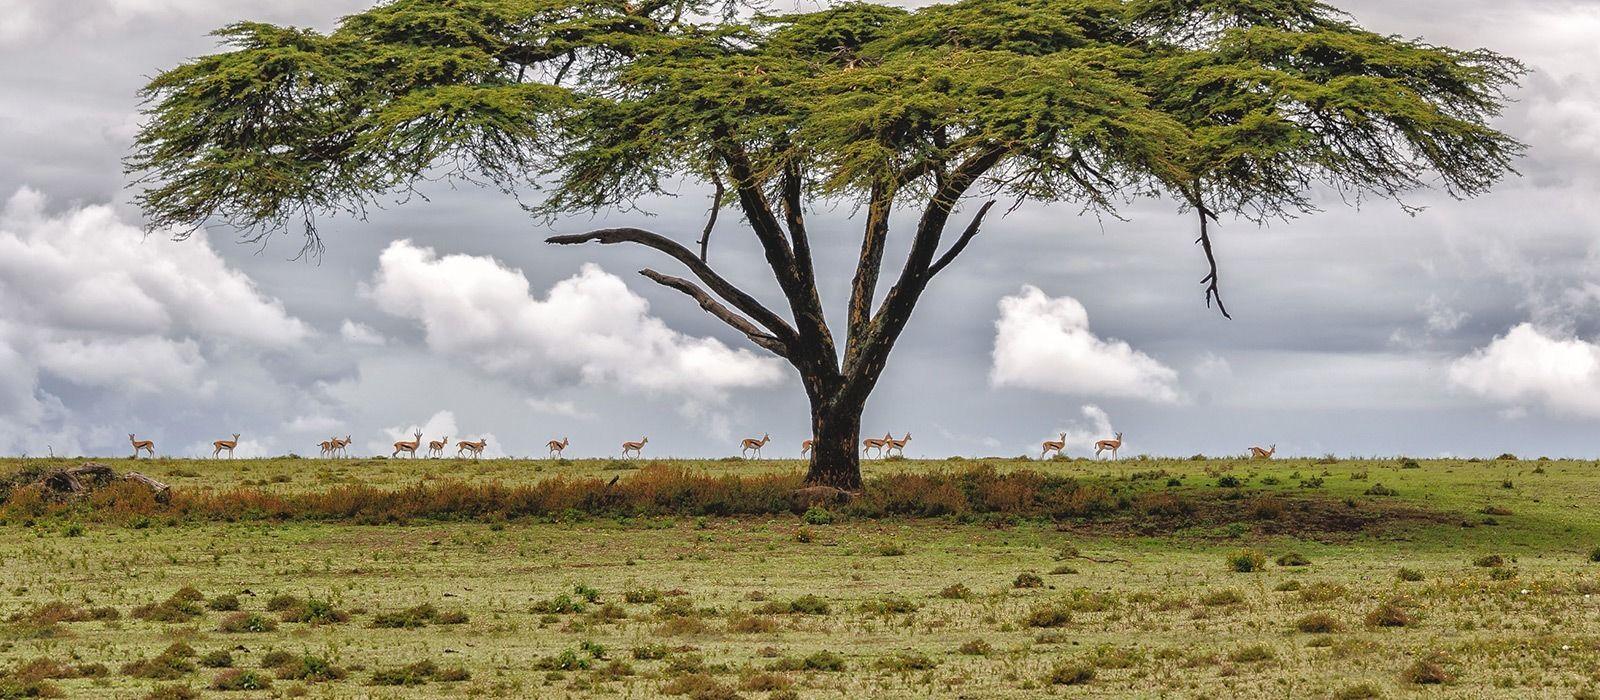 Kenia: Masai Mara, Wandersafaris & Traumstrände Urlaub 1